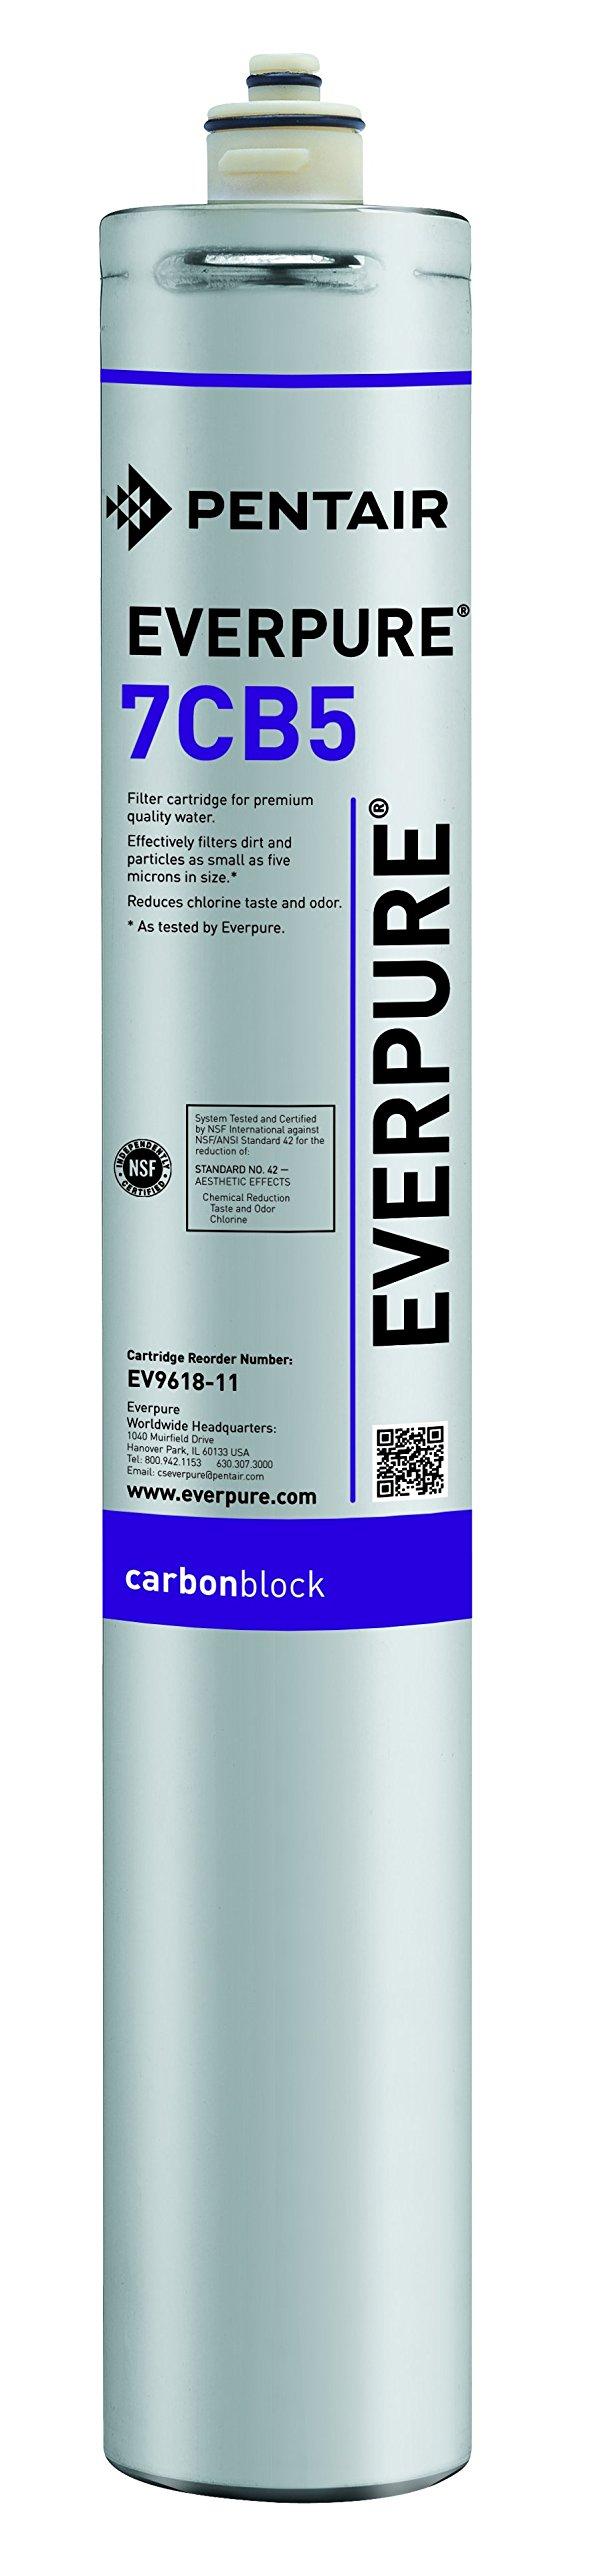 Everpure EV9618-11 7CB5 Filter Cartridge